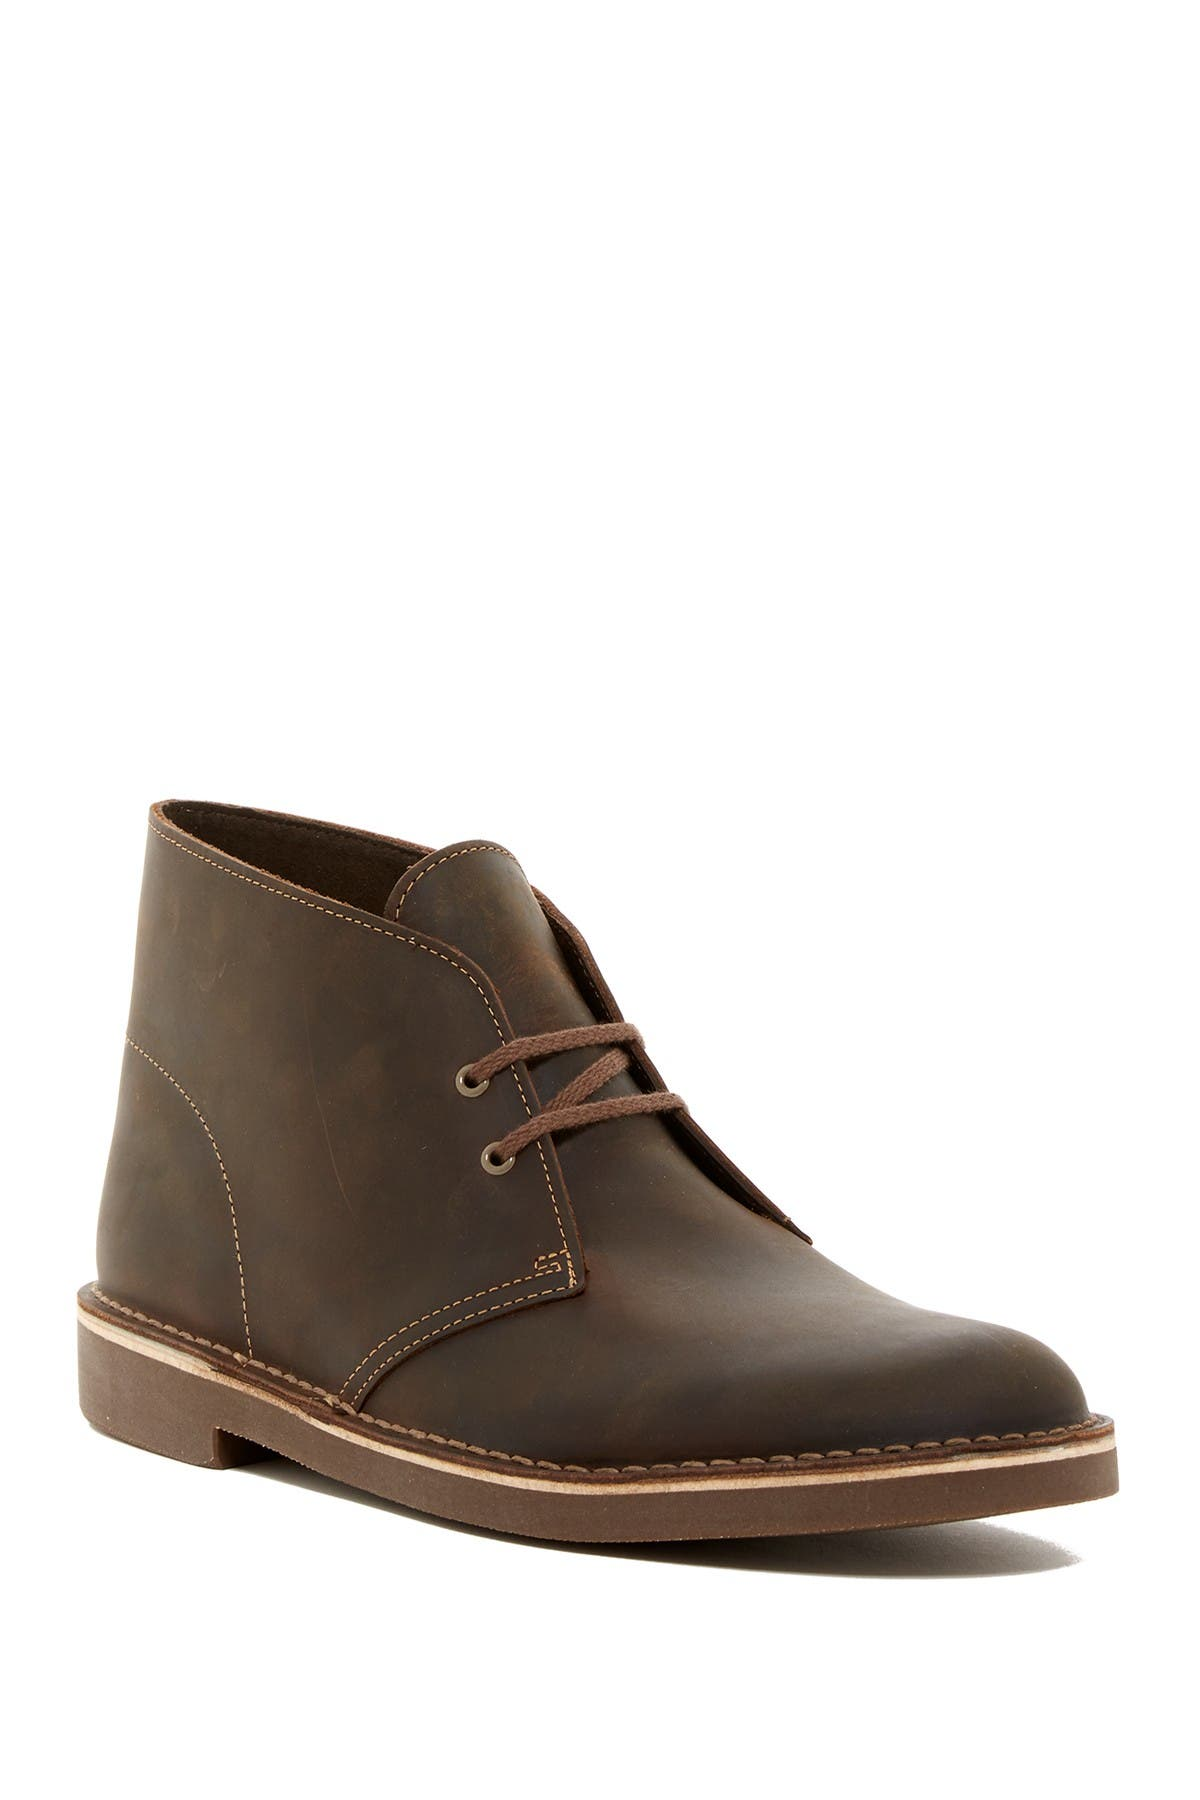 Clarks | Bushacre Leather Chukka Boot